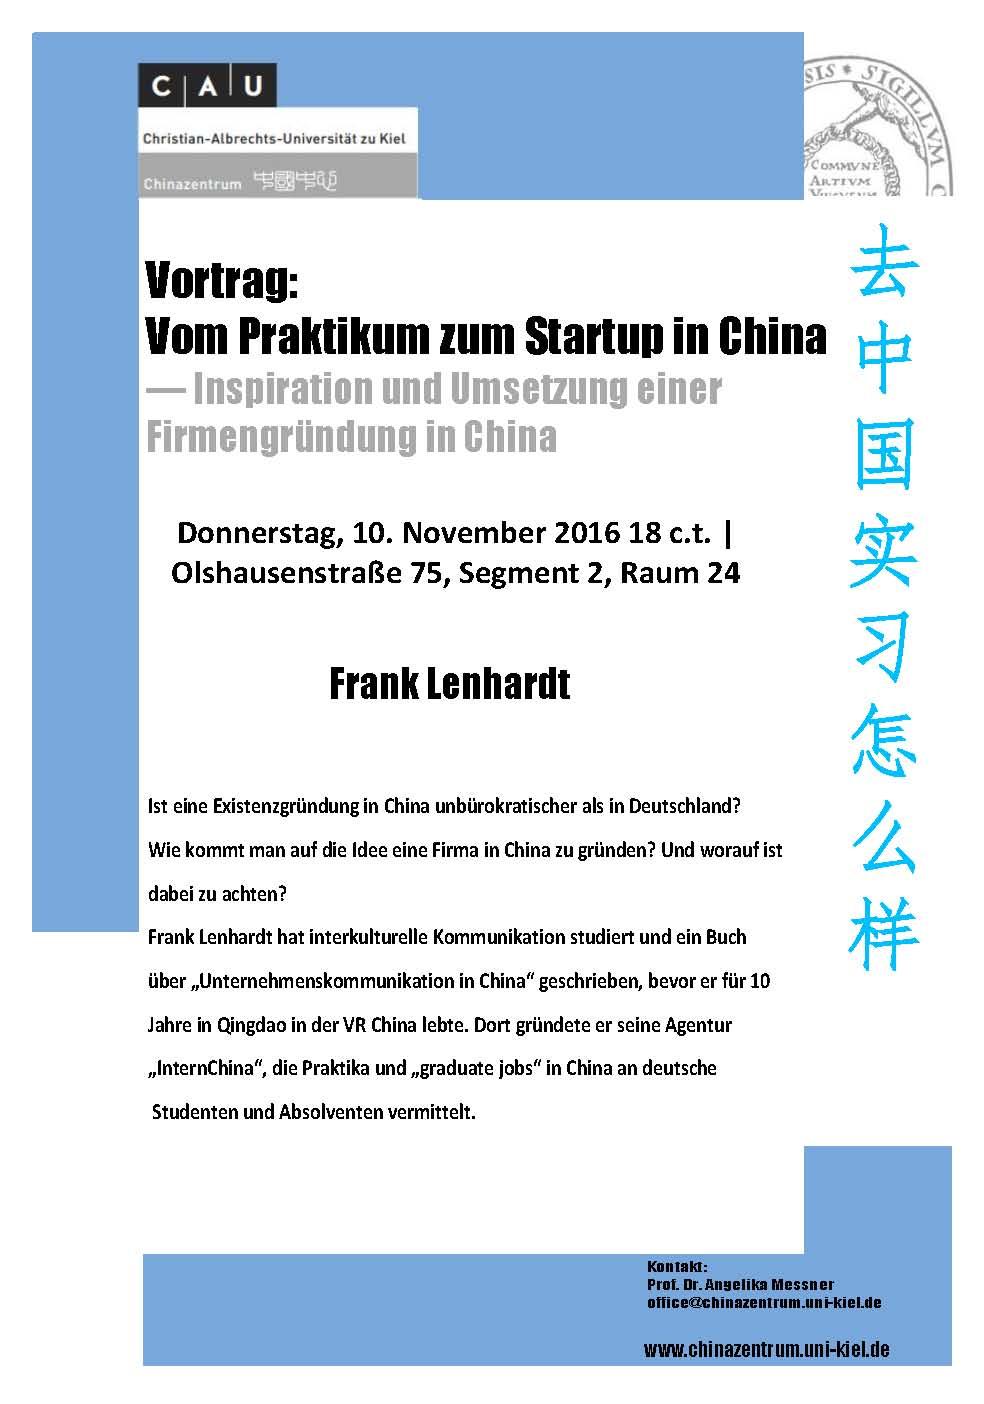 Lenhardt/Praktikum zum Startup (Plakat)